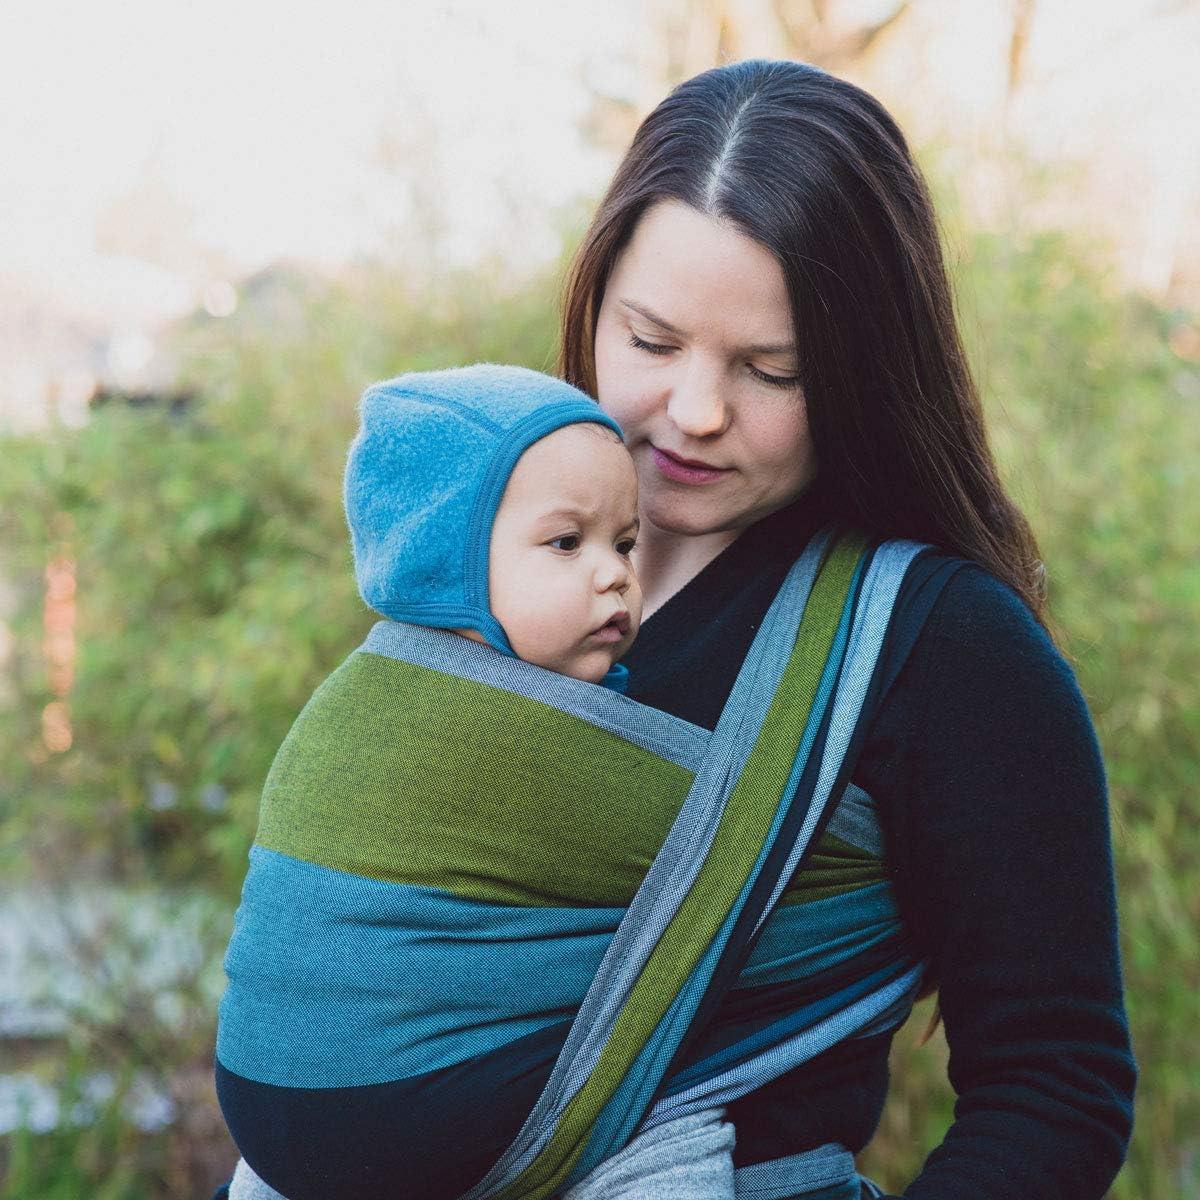 2.Wahl Hoppediz gewebtes Baby-Tragetuch Aberdeen